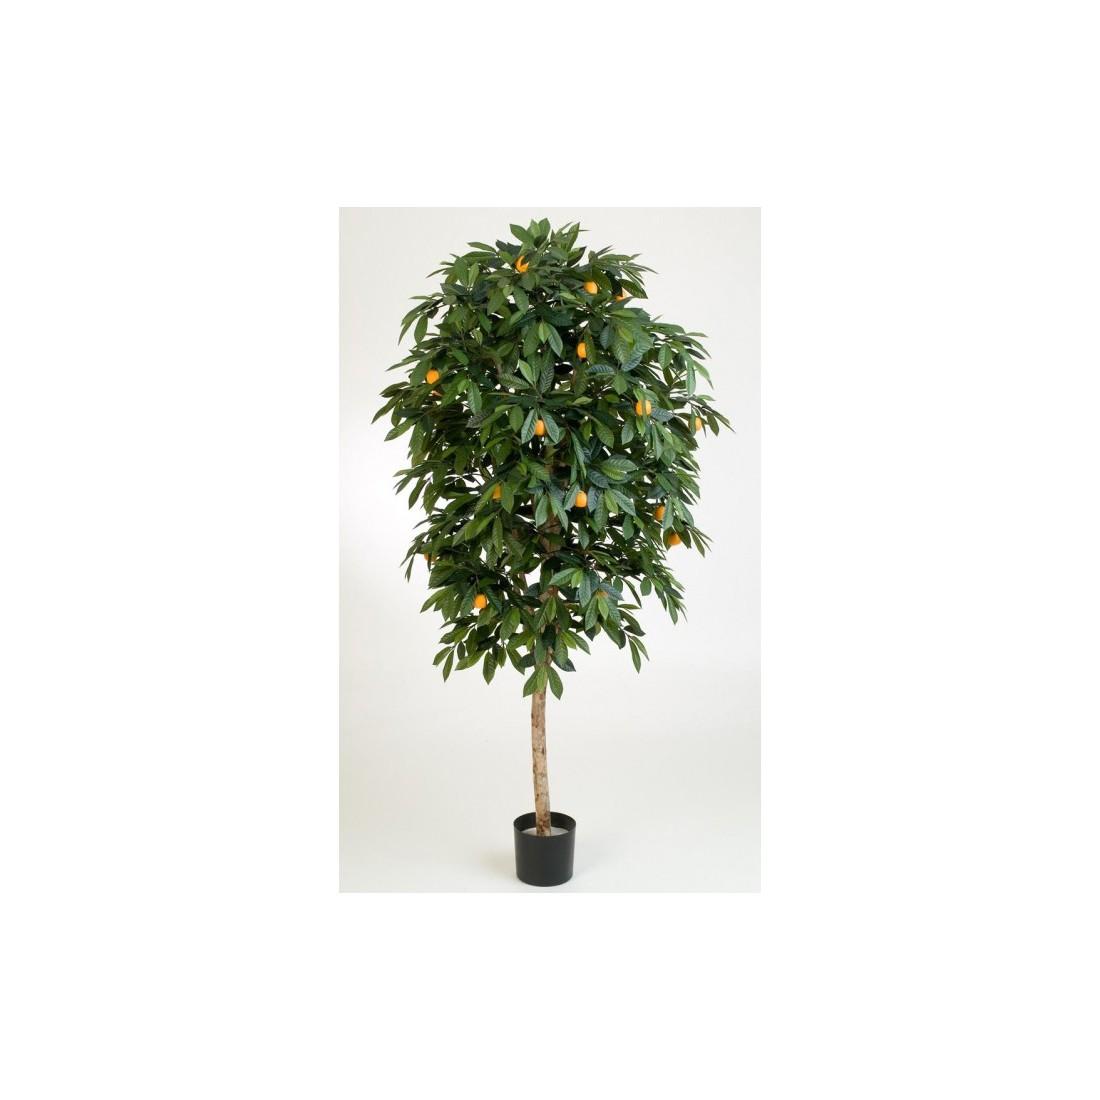 mandarinier artificiel arbre 110 170 cm arbres mediterraneens reflets nature lyon. Black Bedroom Furniture Sets. Home Design Ideas